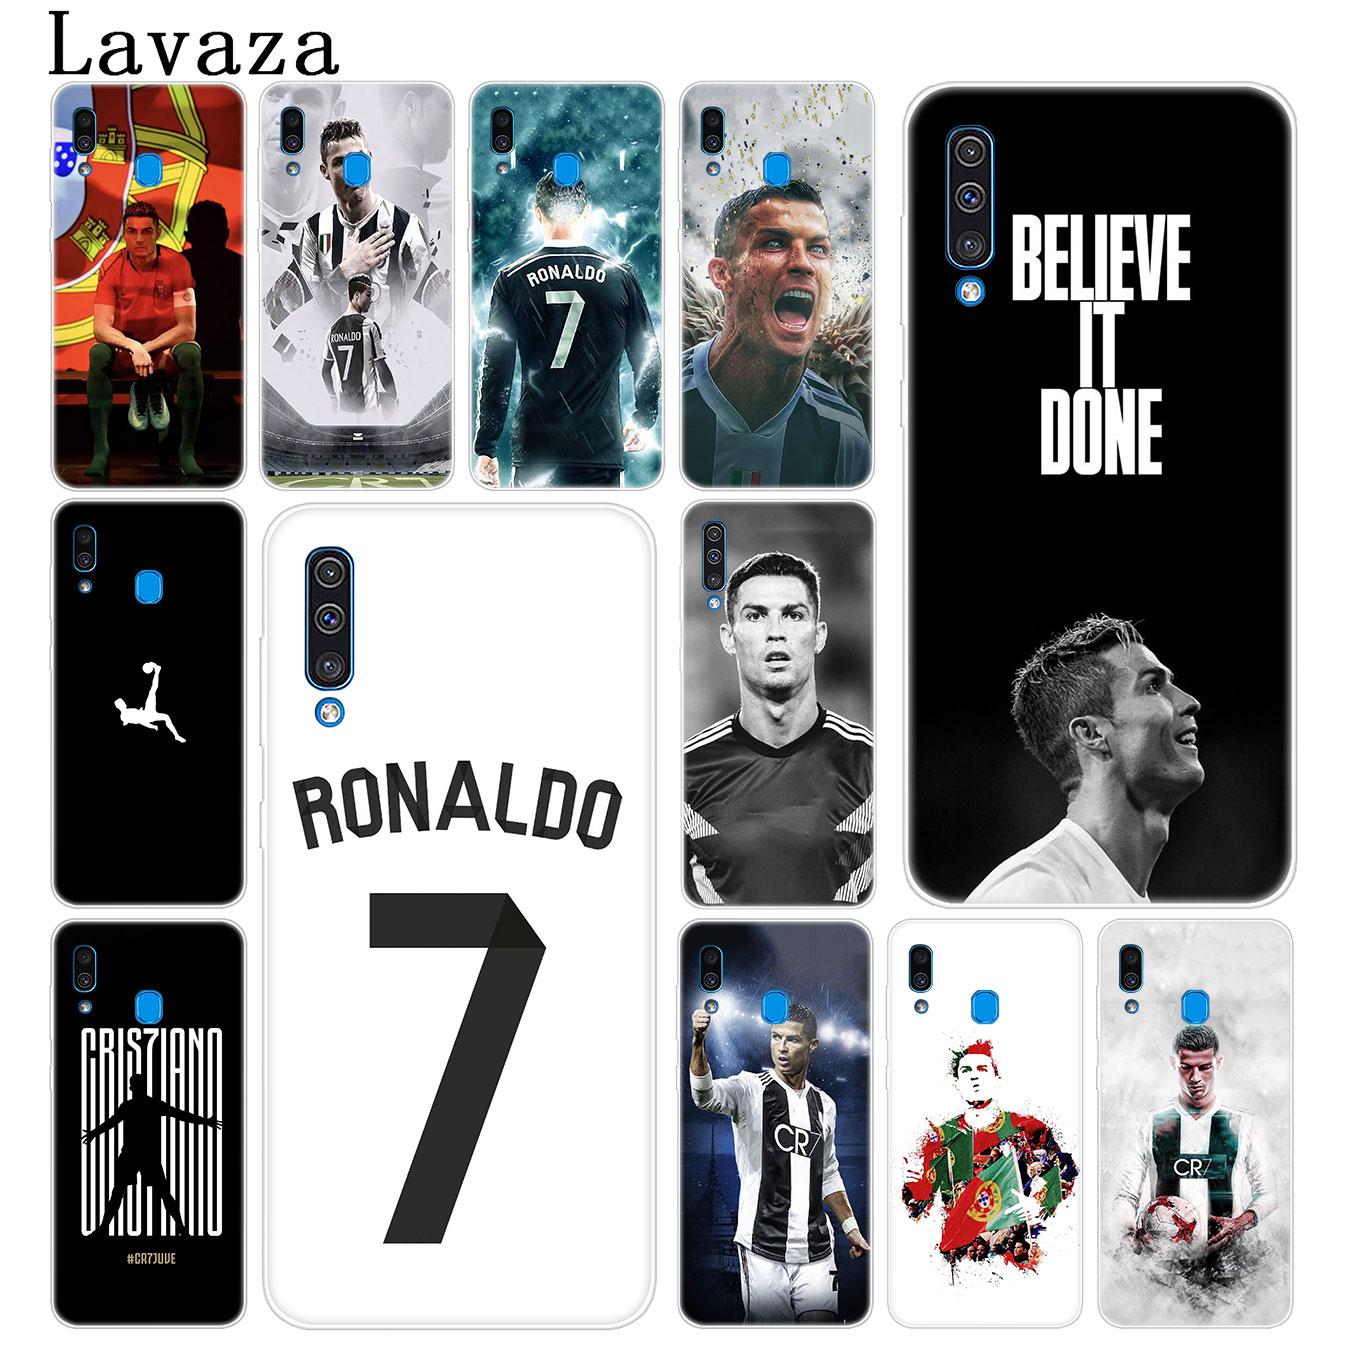 Lavaza Sword Art Online Hard Phone Shell Case For Meizu M6s M3 M3s M5 Mini M6 Note M5c M5s Back Cover Reasonable Price Cellphones & Telecommunications